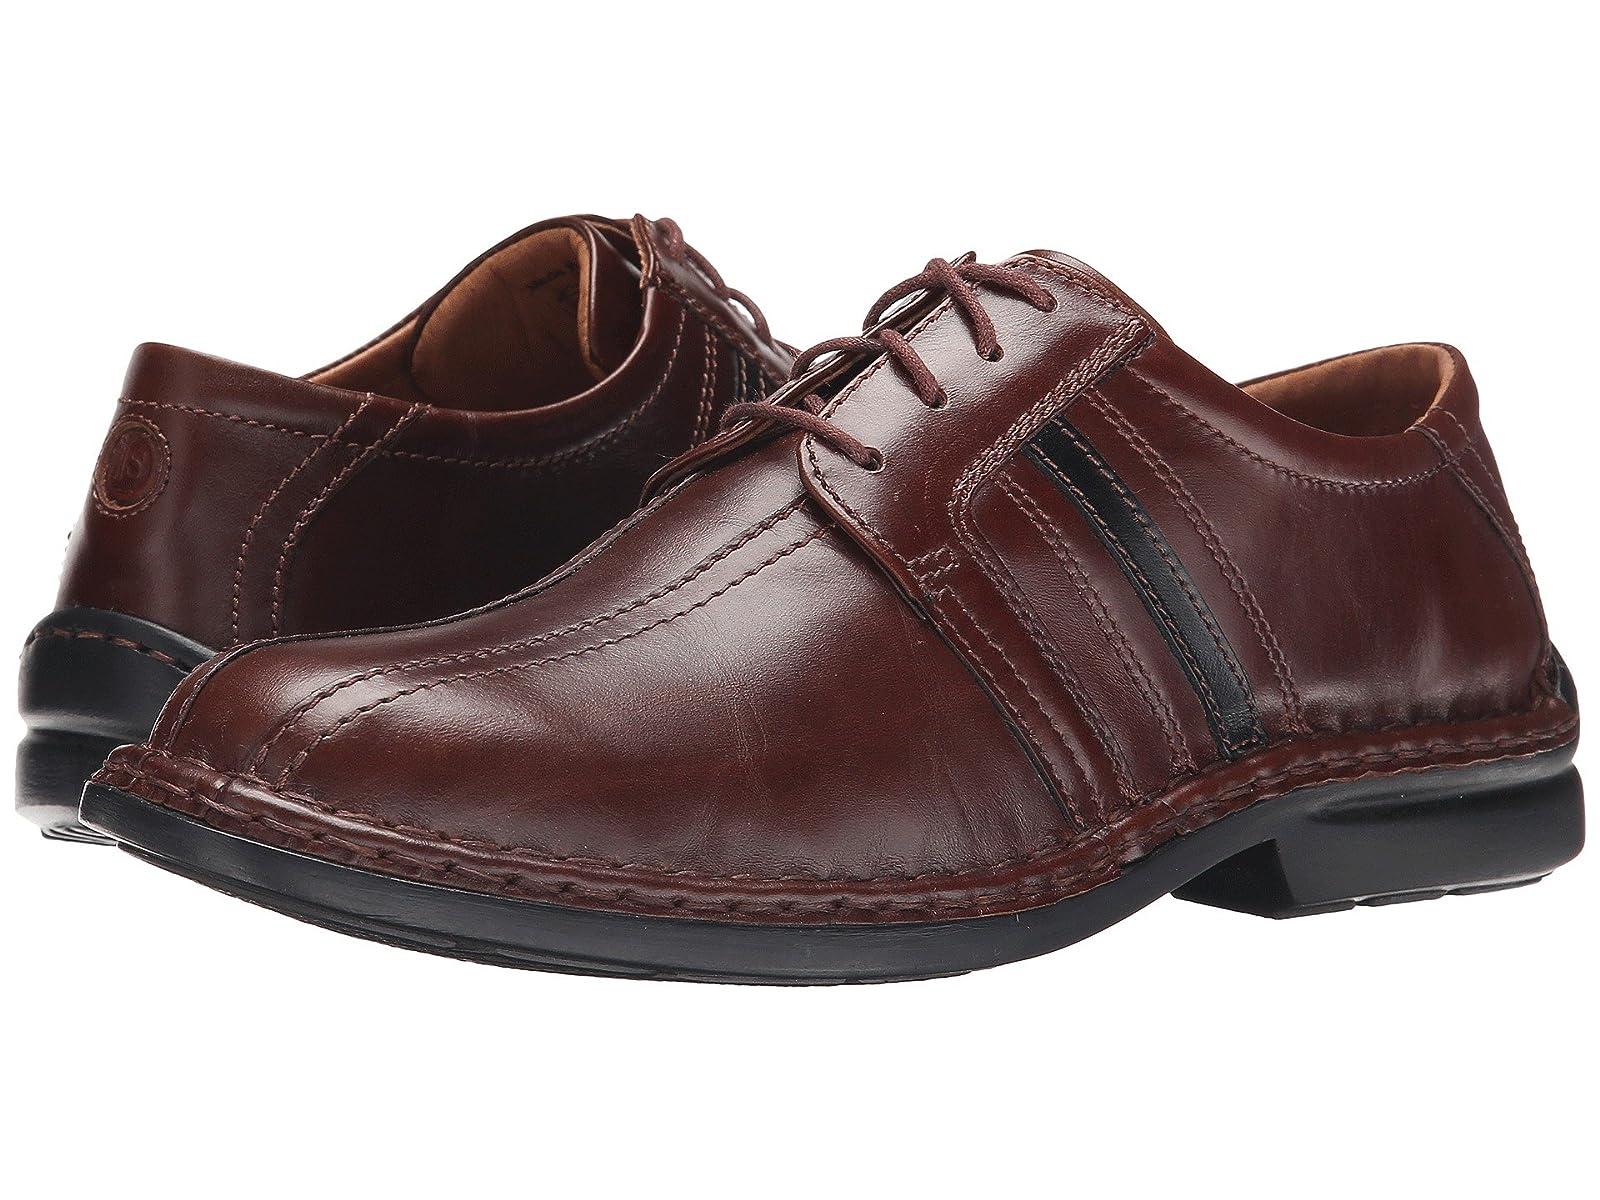 Josef Seibel Vigo 02Atmospheric grades have affordable shoes